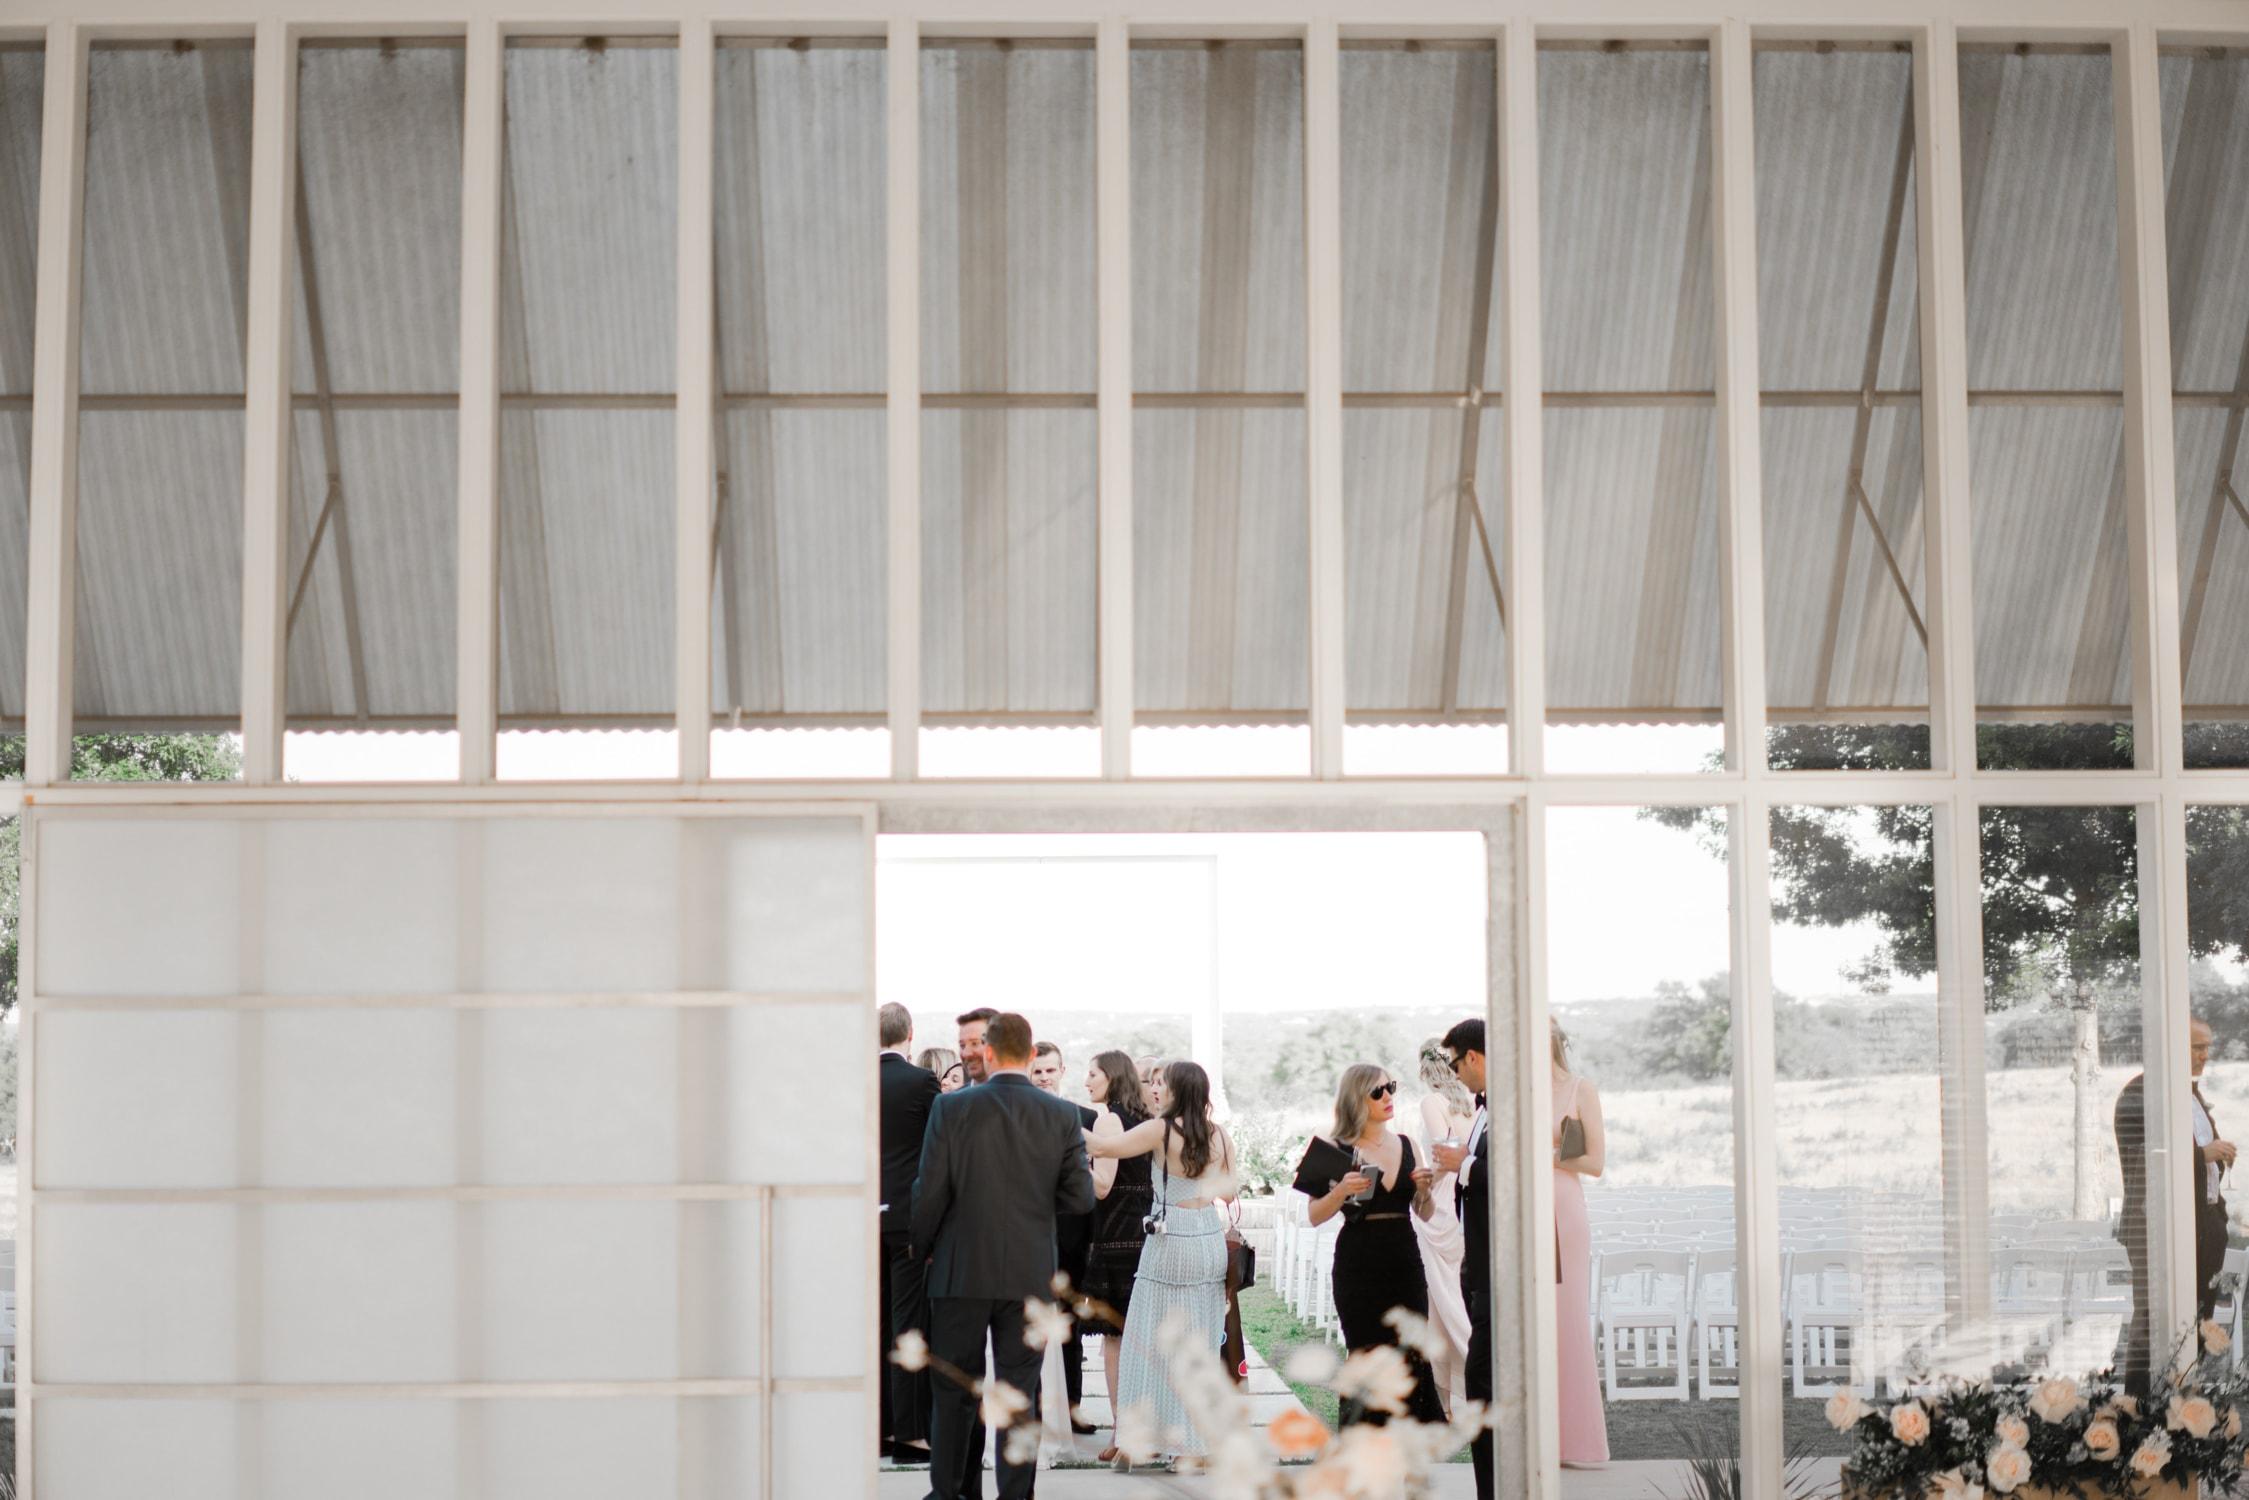 PROSPECT_HOUSE_WEDDING_AUSTIN_TX_MATTHEW_MOORE-00650.jpg